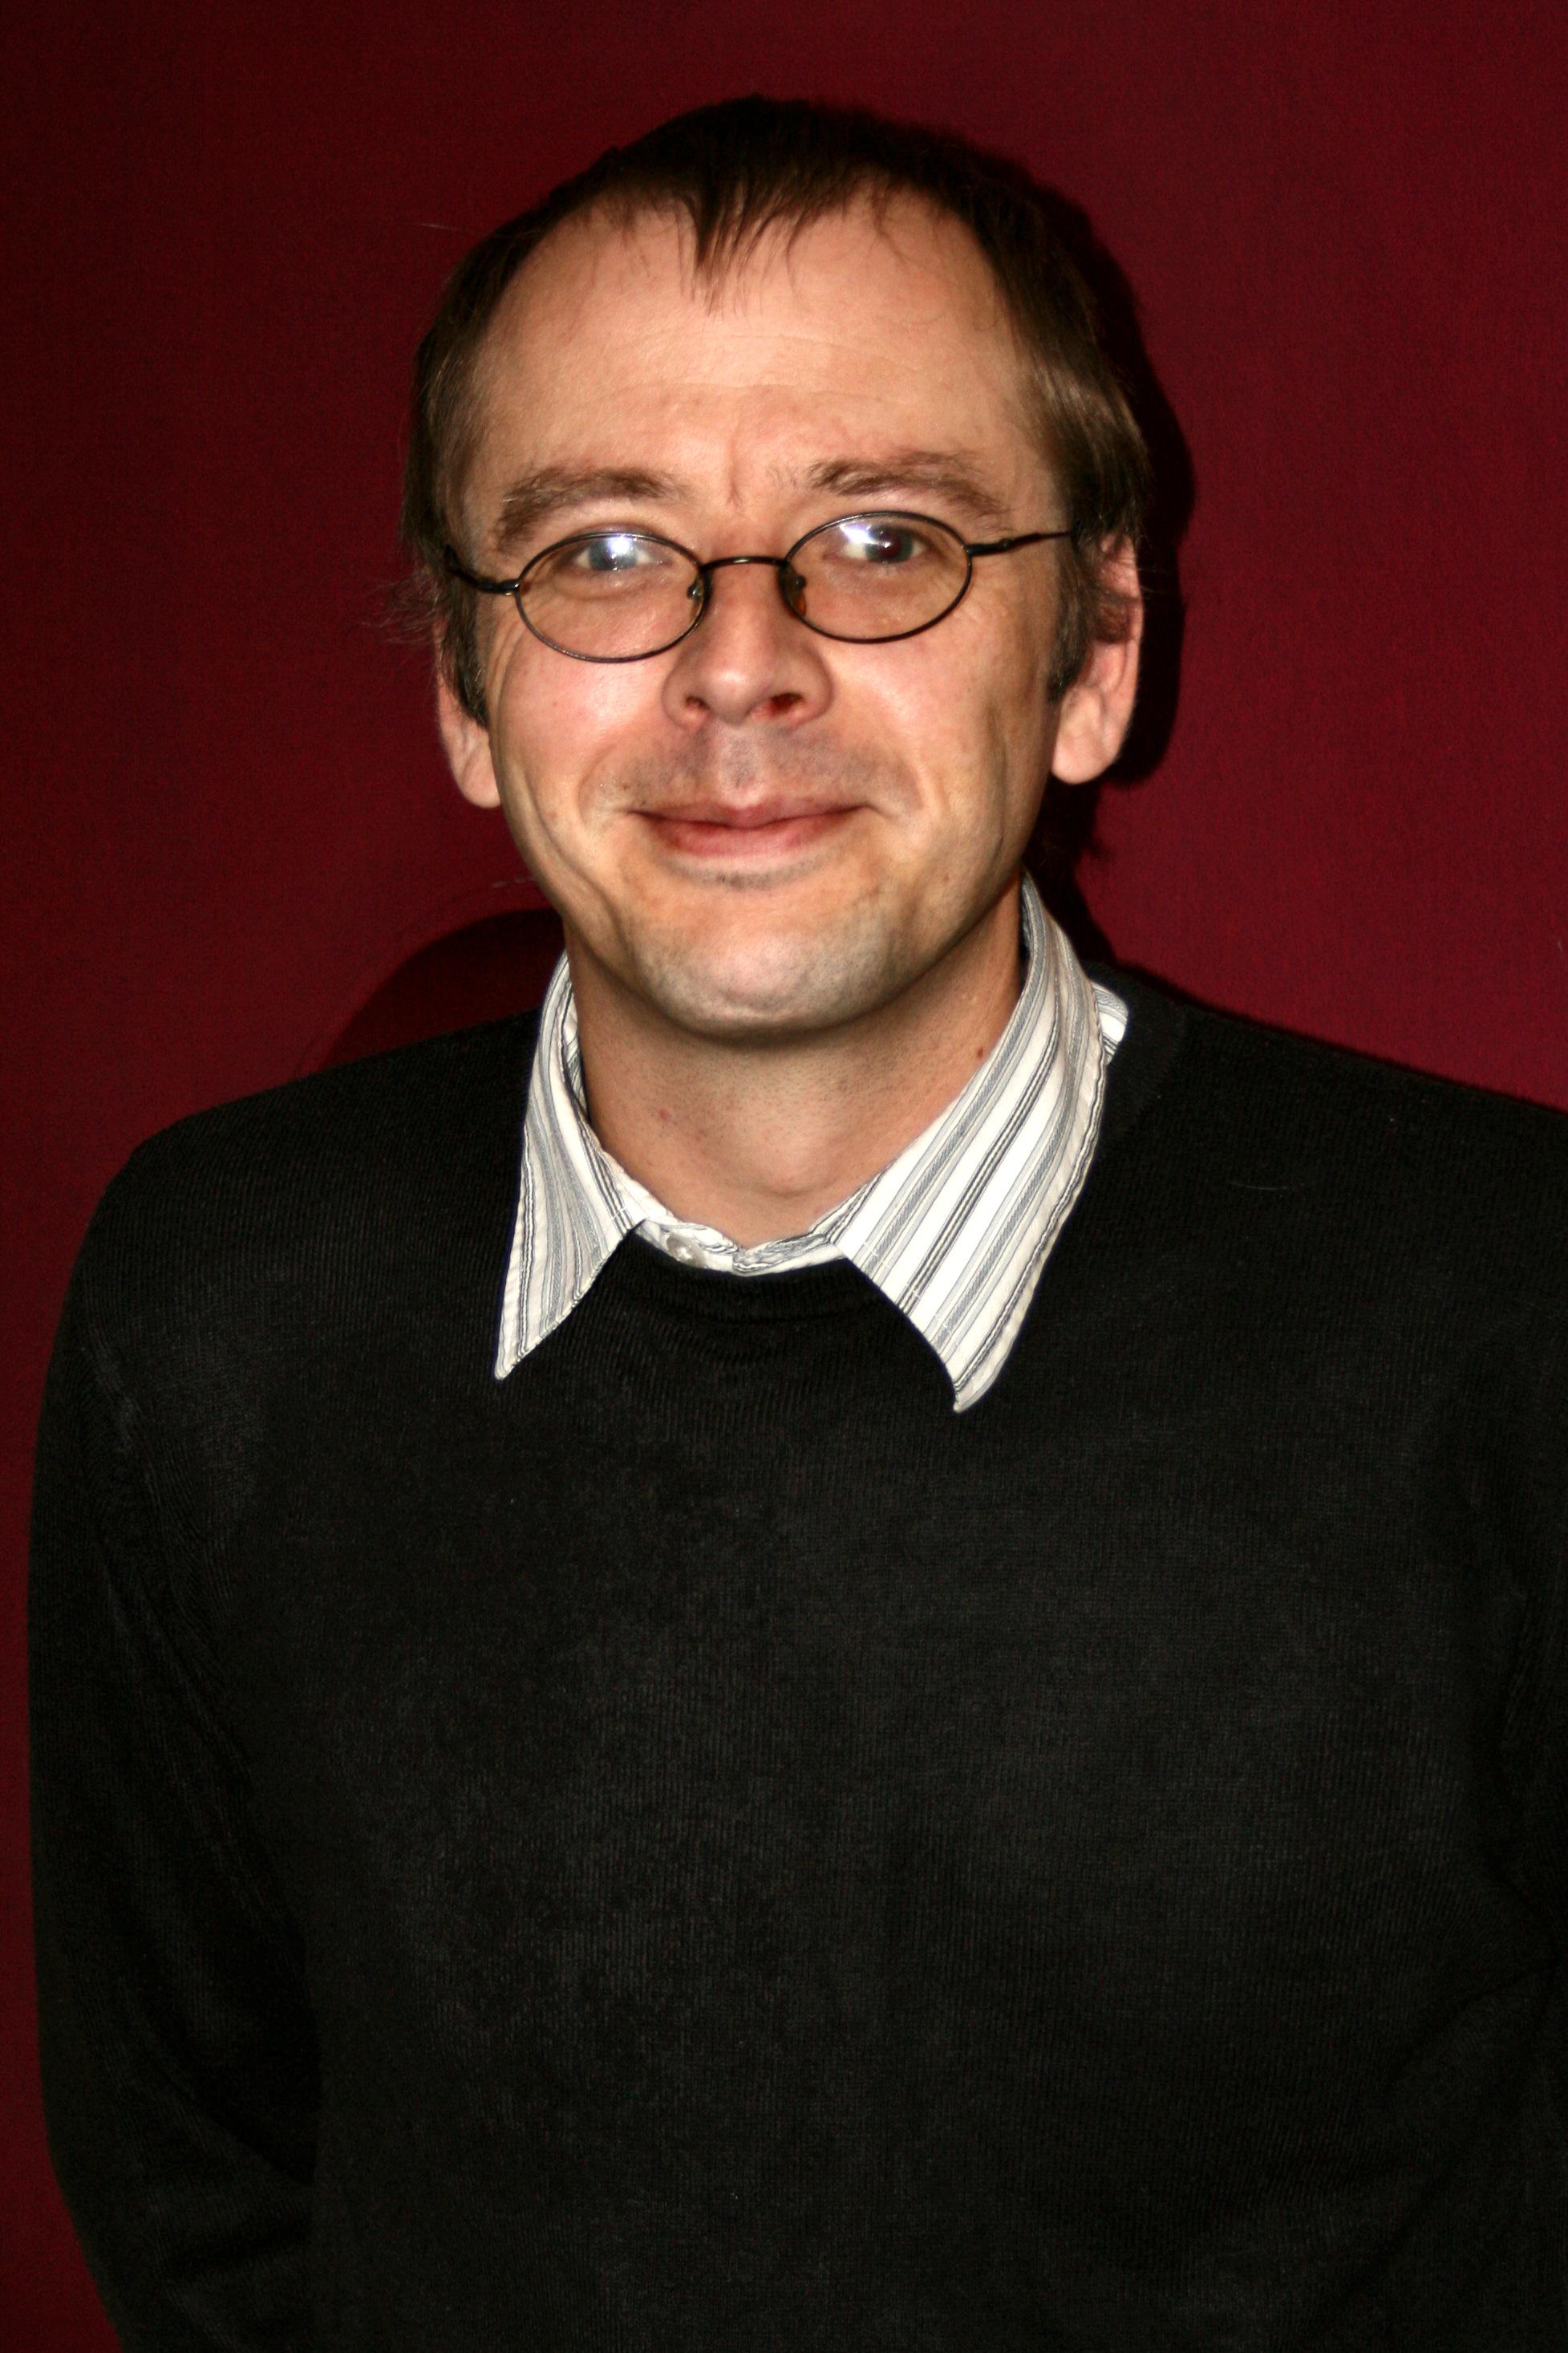 Ian Nickson